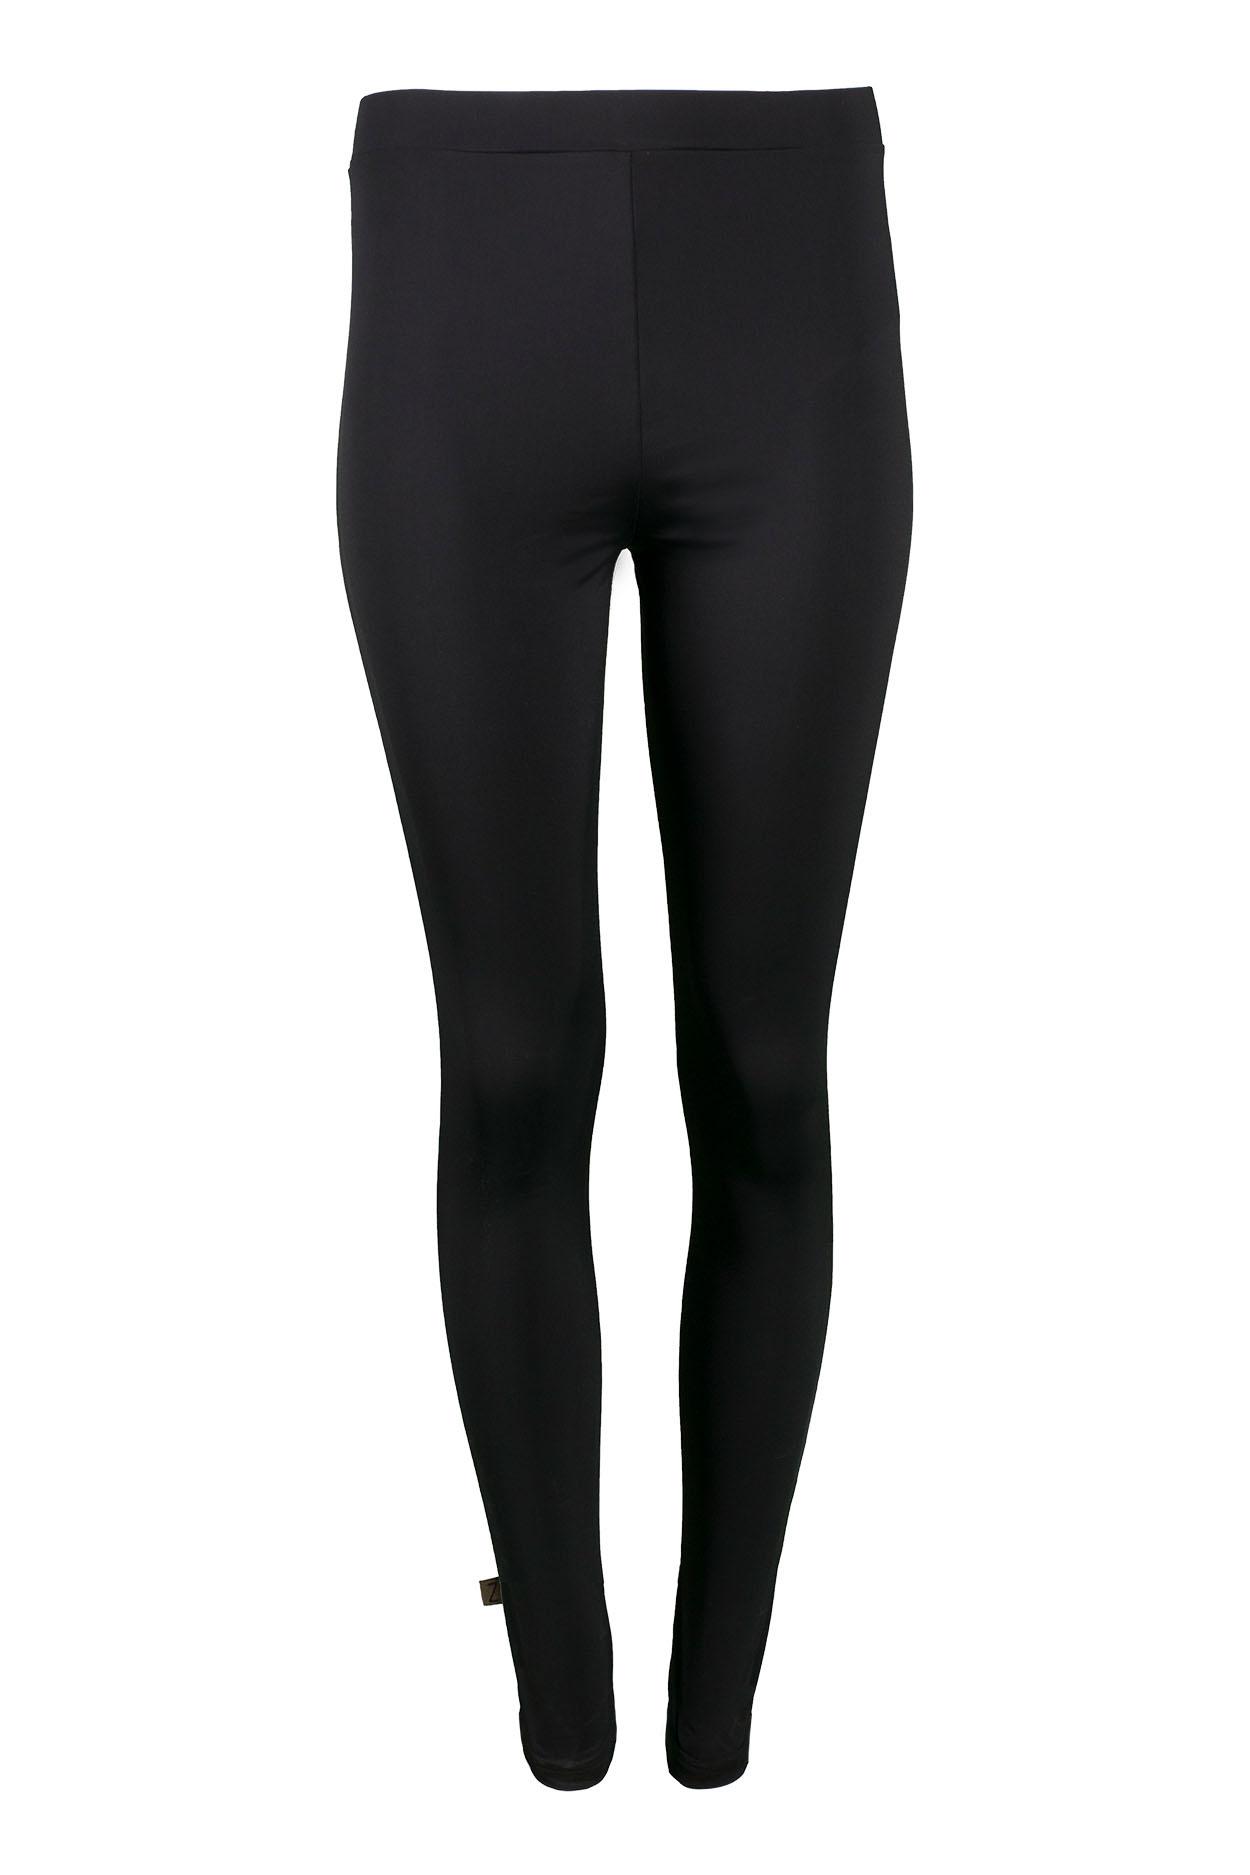 Zusss Gladde legging zwart M/L